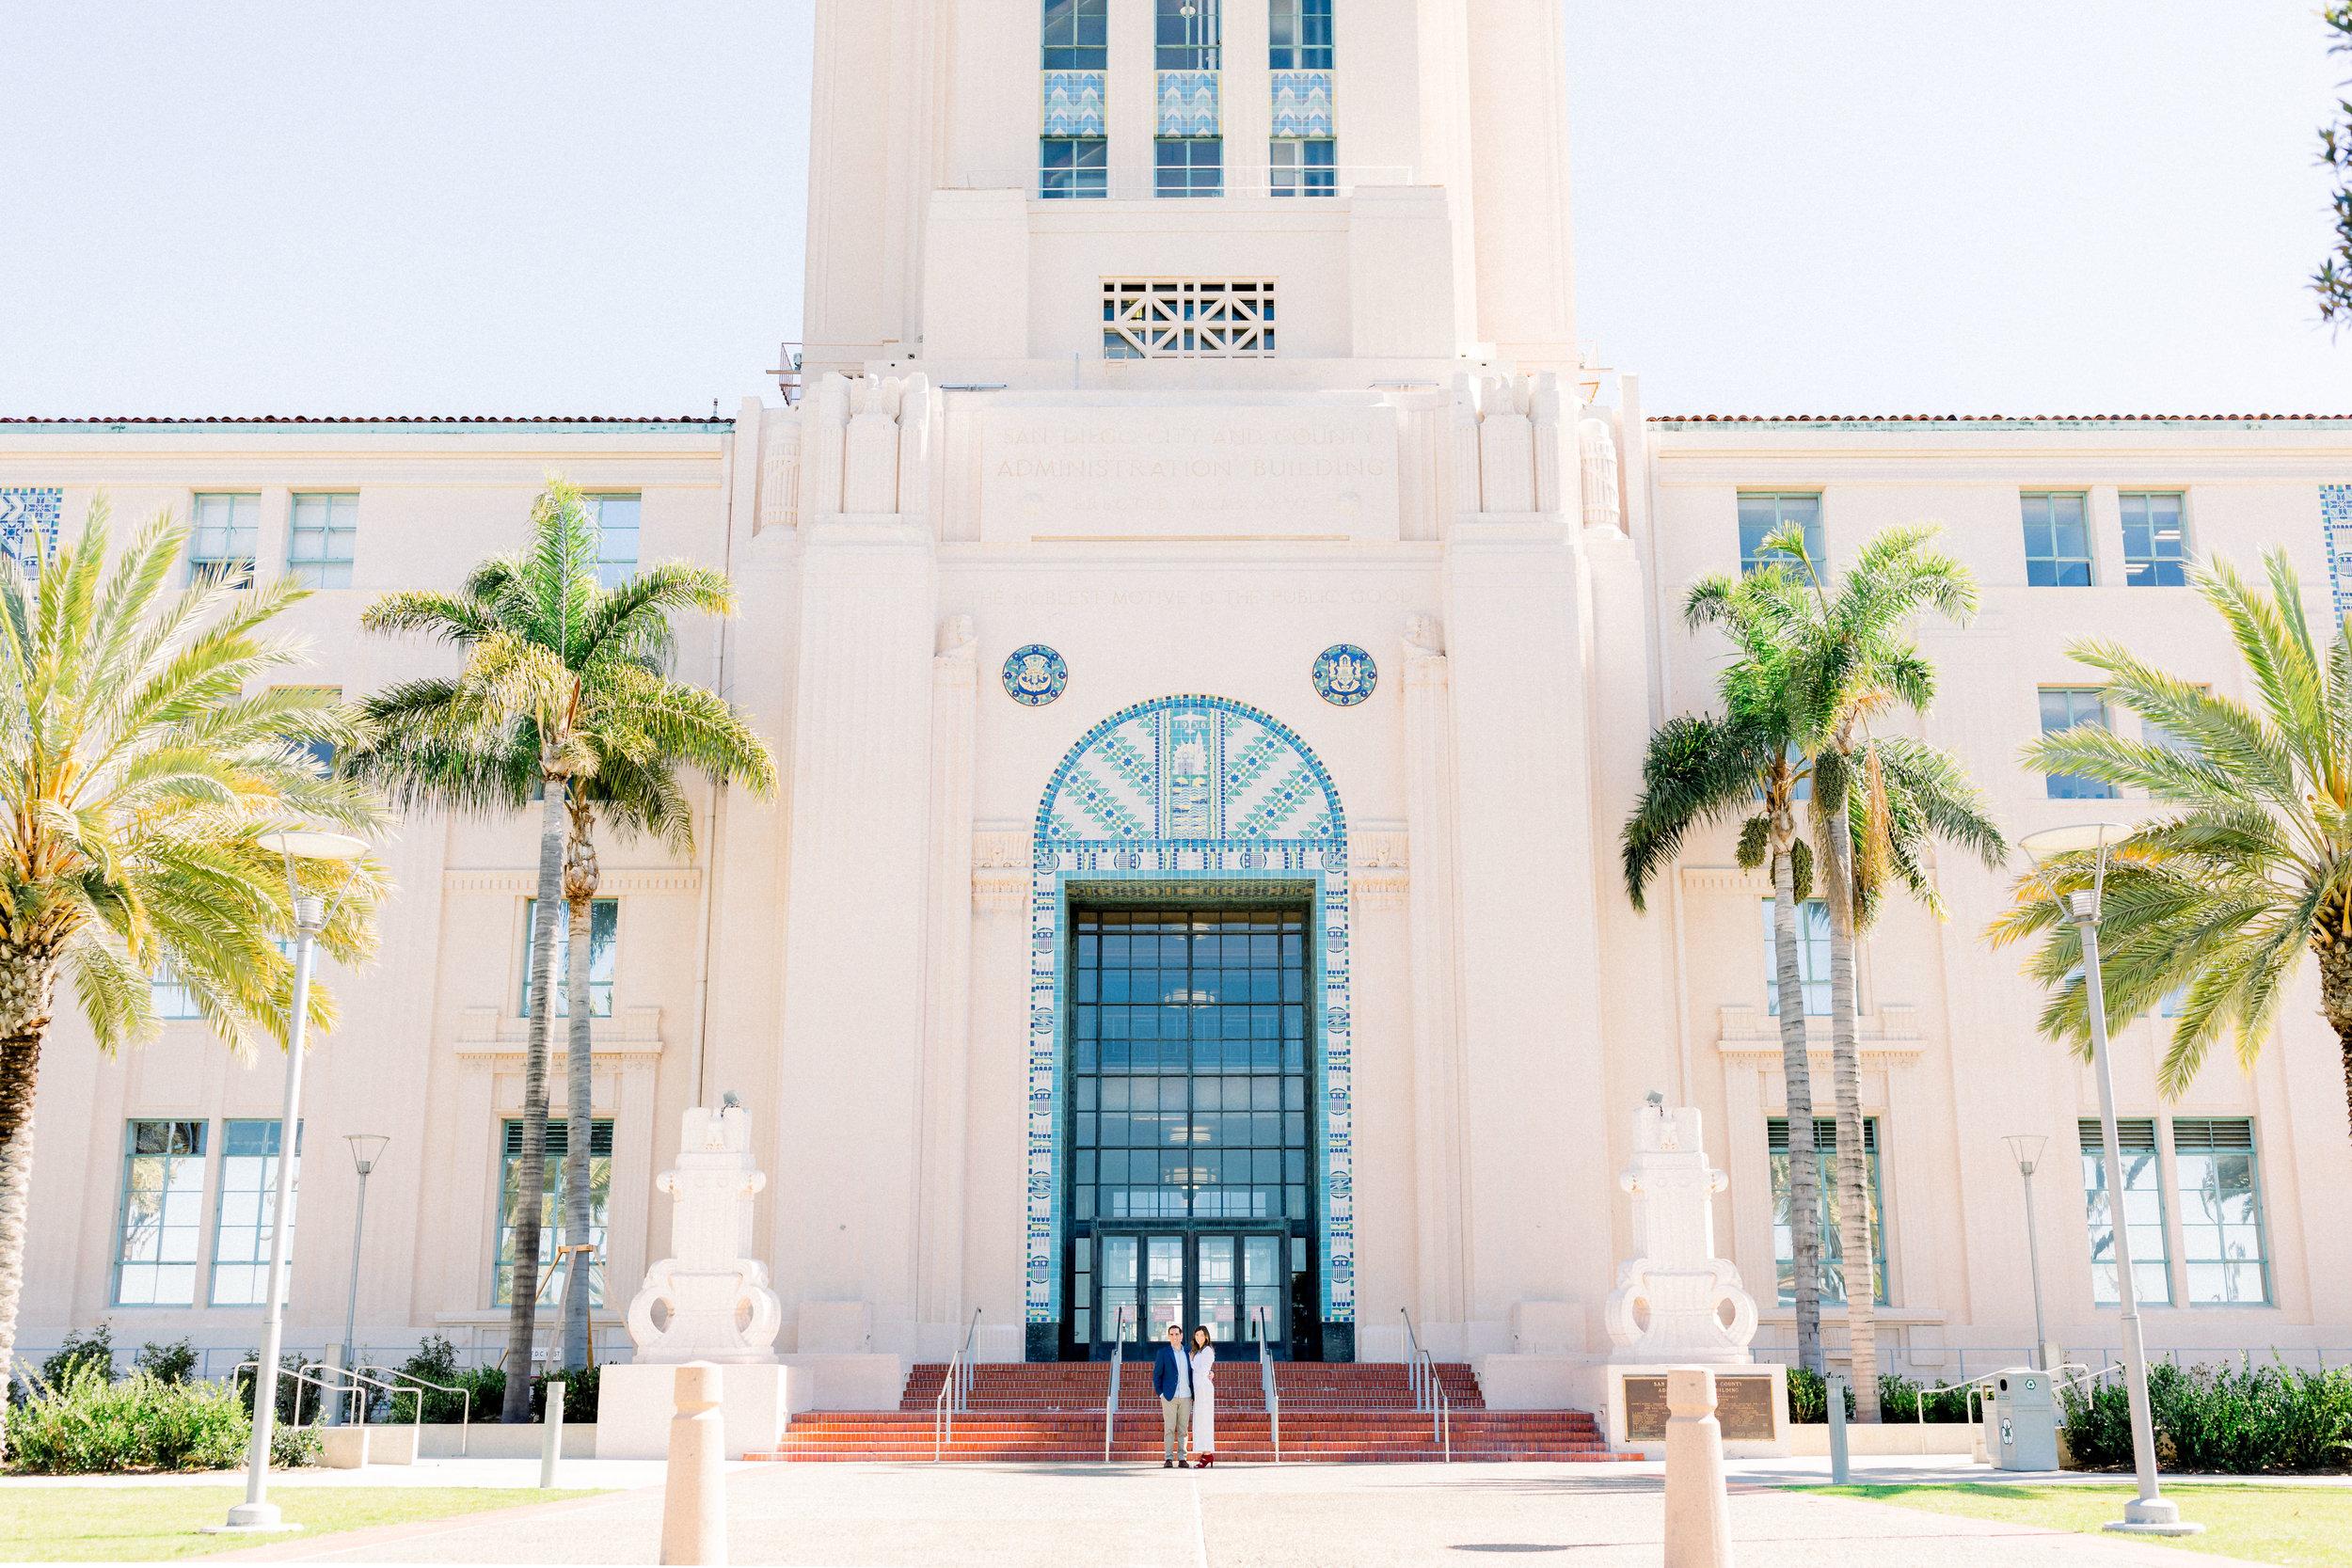 Claire_and_Dan_San_Diego_Administration_Building_Elopement_Alyssa_Boynton_Photography-1.jpg